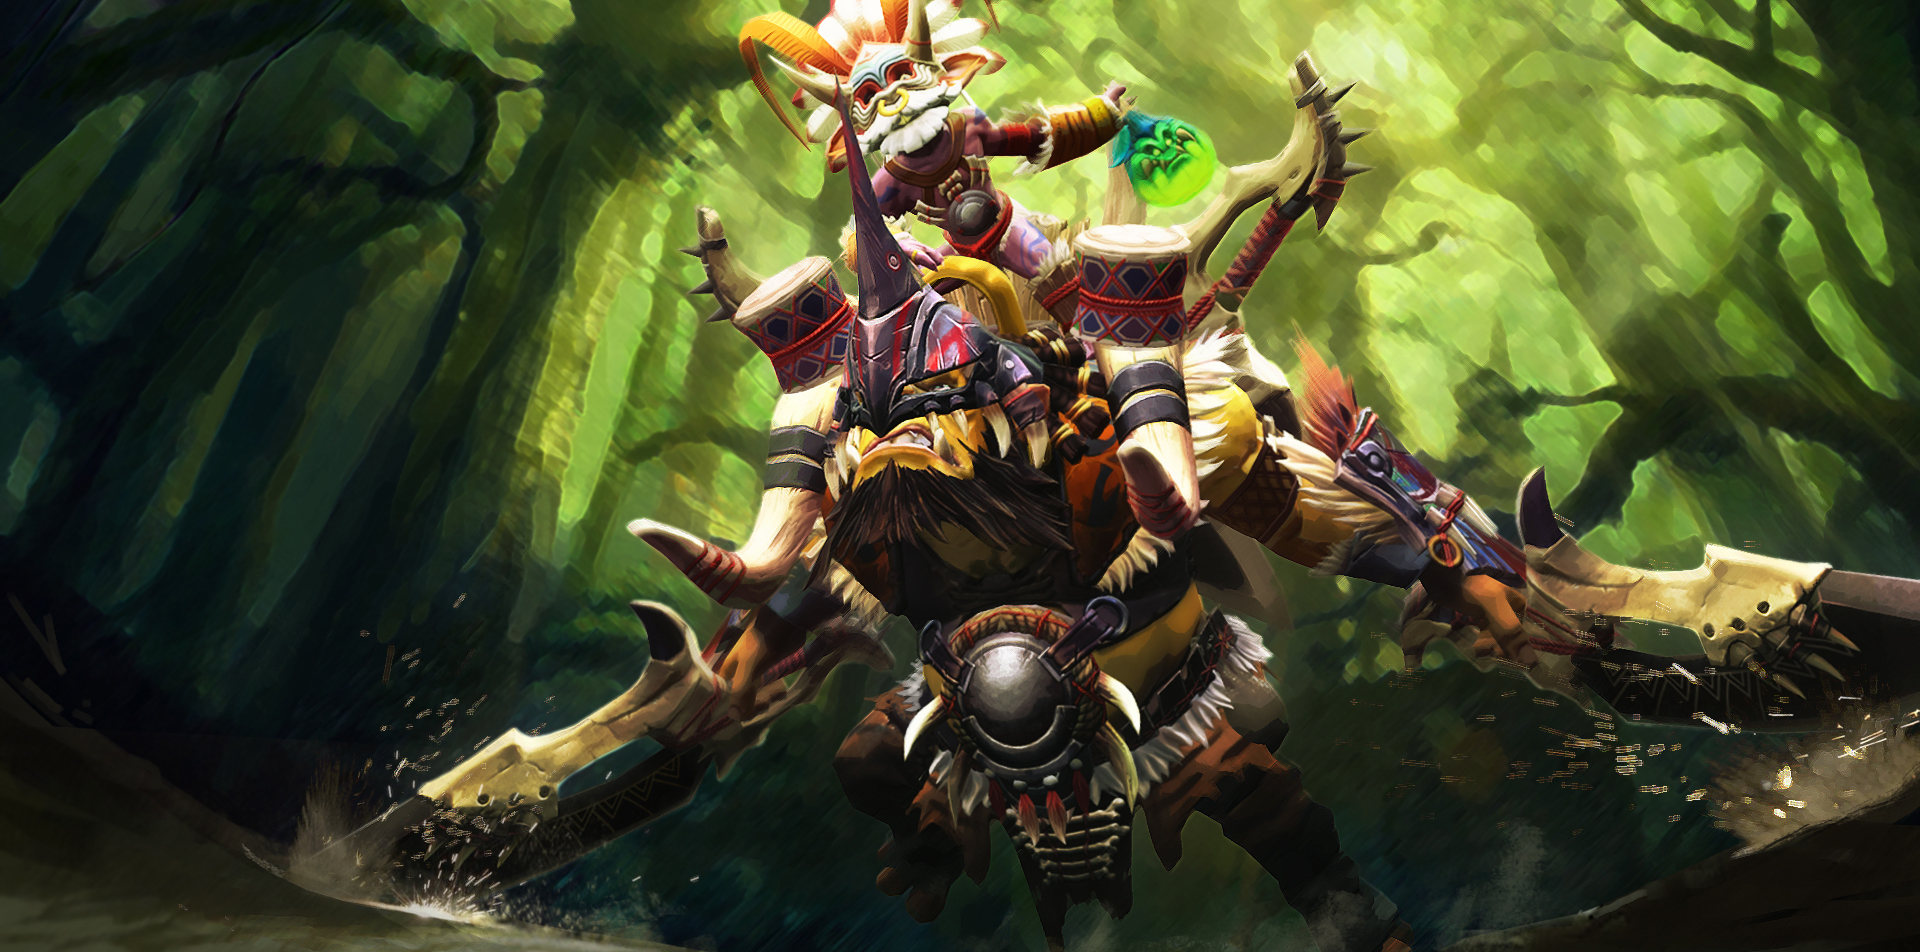 Steam Workshop::Alchemist-Jungle Chief Dota 2 how to play alchemist